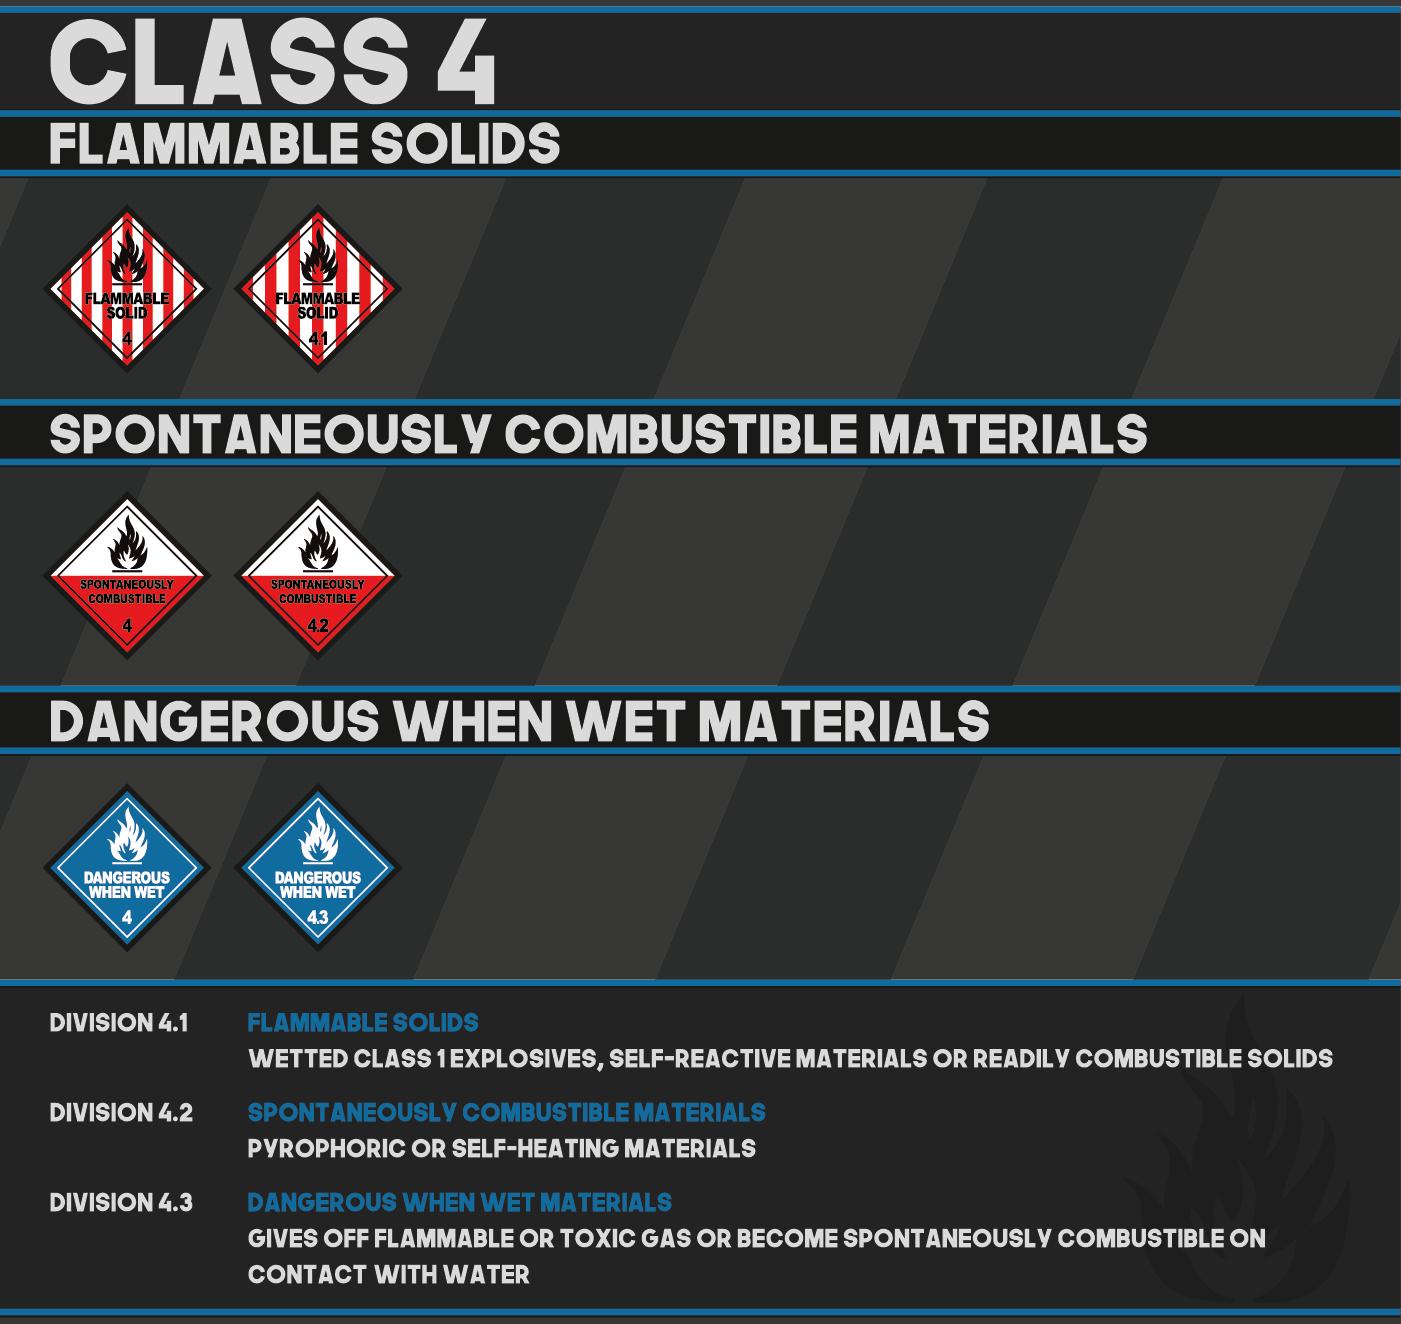 Hazardous Class 4